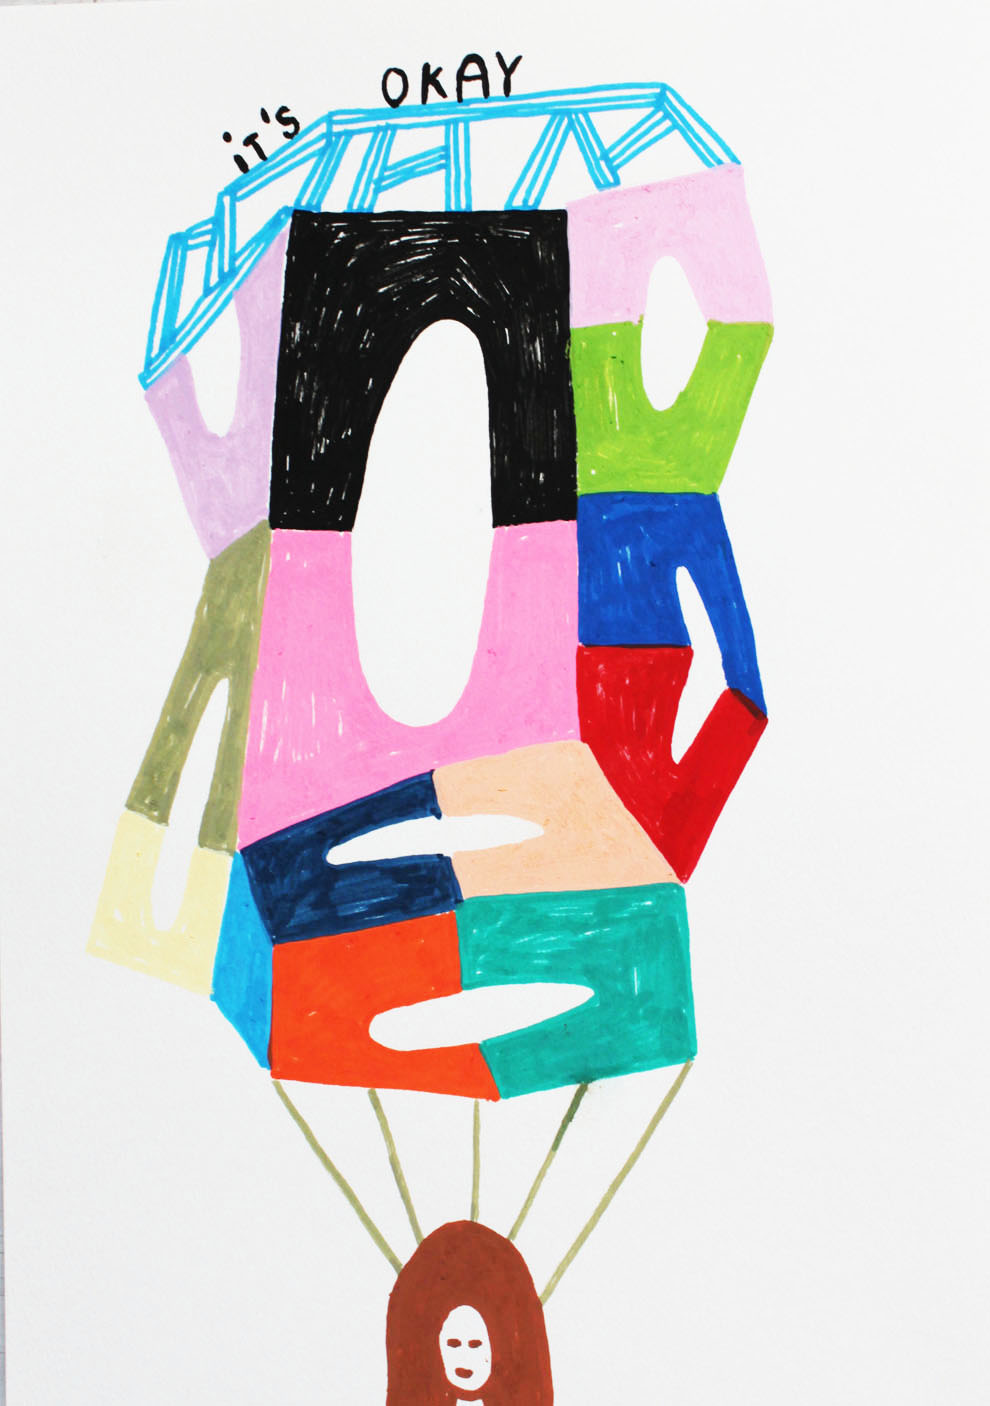 """It's okay""Acrylic tusch on paper.29,7 x 21 cm.2014. (sold) -"